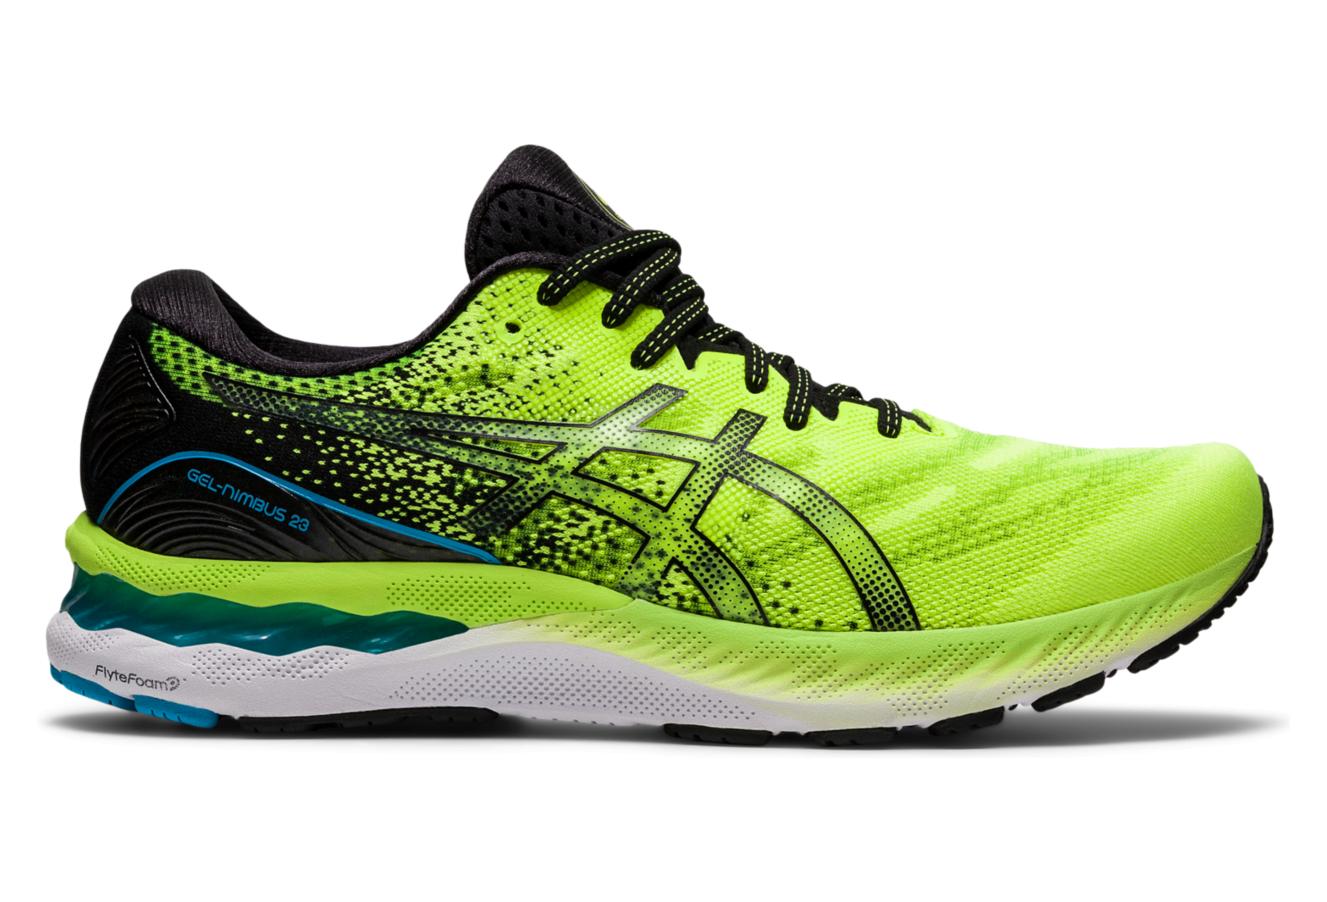 Asics Gel Nimbus 23 Running Shoes Yellow Blue | Alltricks.com